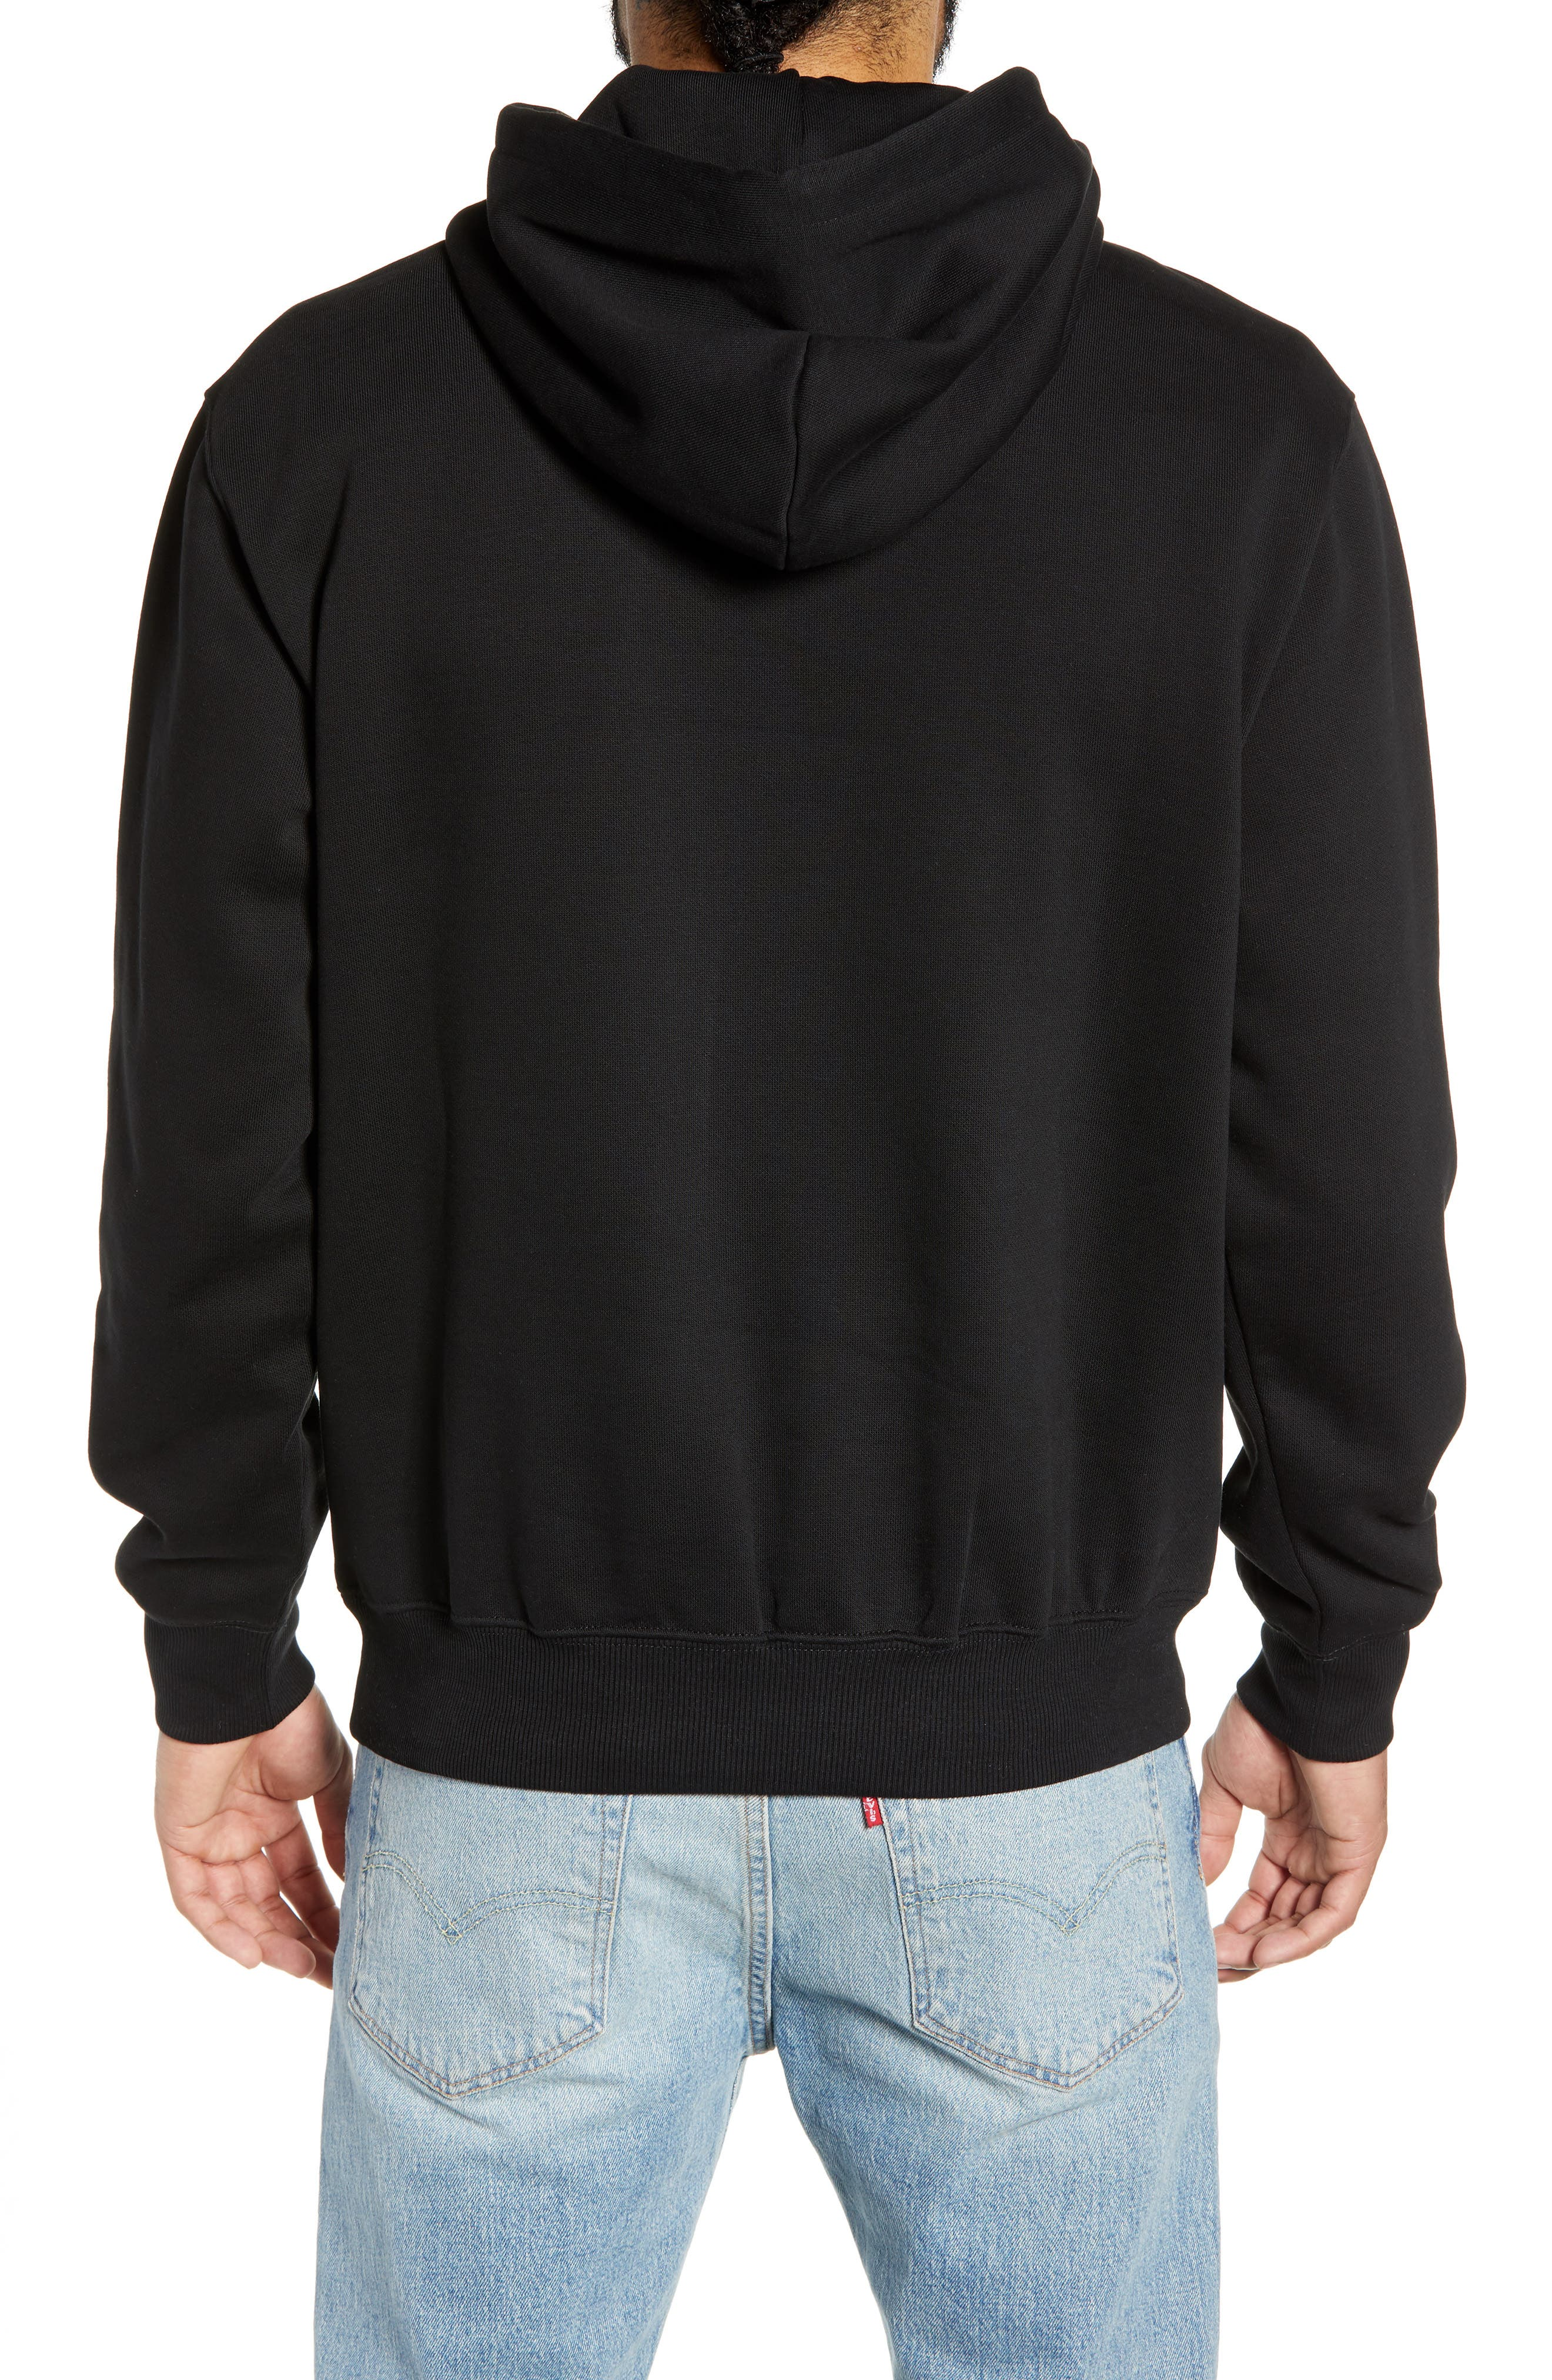 CARHARTT WORK IN PROGRESS, Logo Embroidered Hooded Sweatshirt, Alternate thumbnail 2, color, BLACK / WHITE